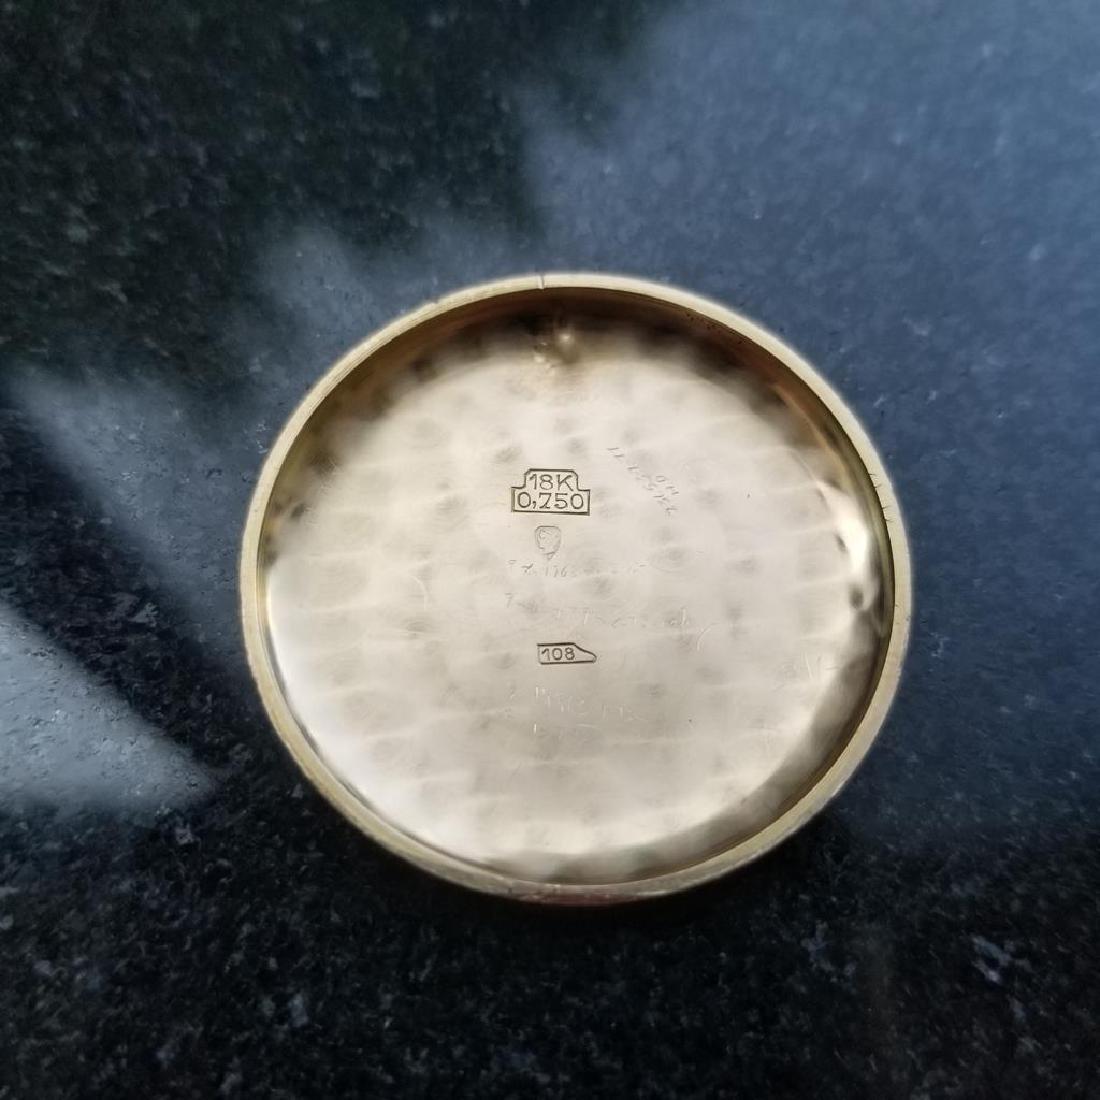 BREITLING Men's 18K Solid Rose Gold Chronograph ref.787 - 10